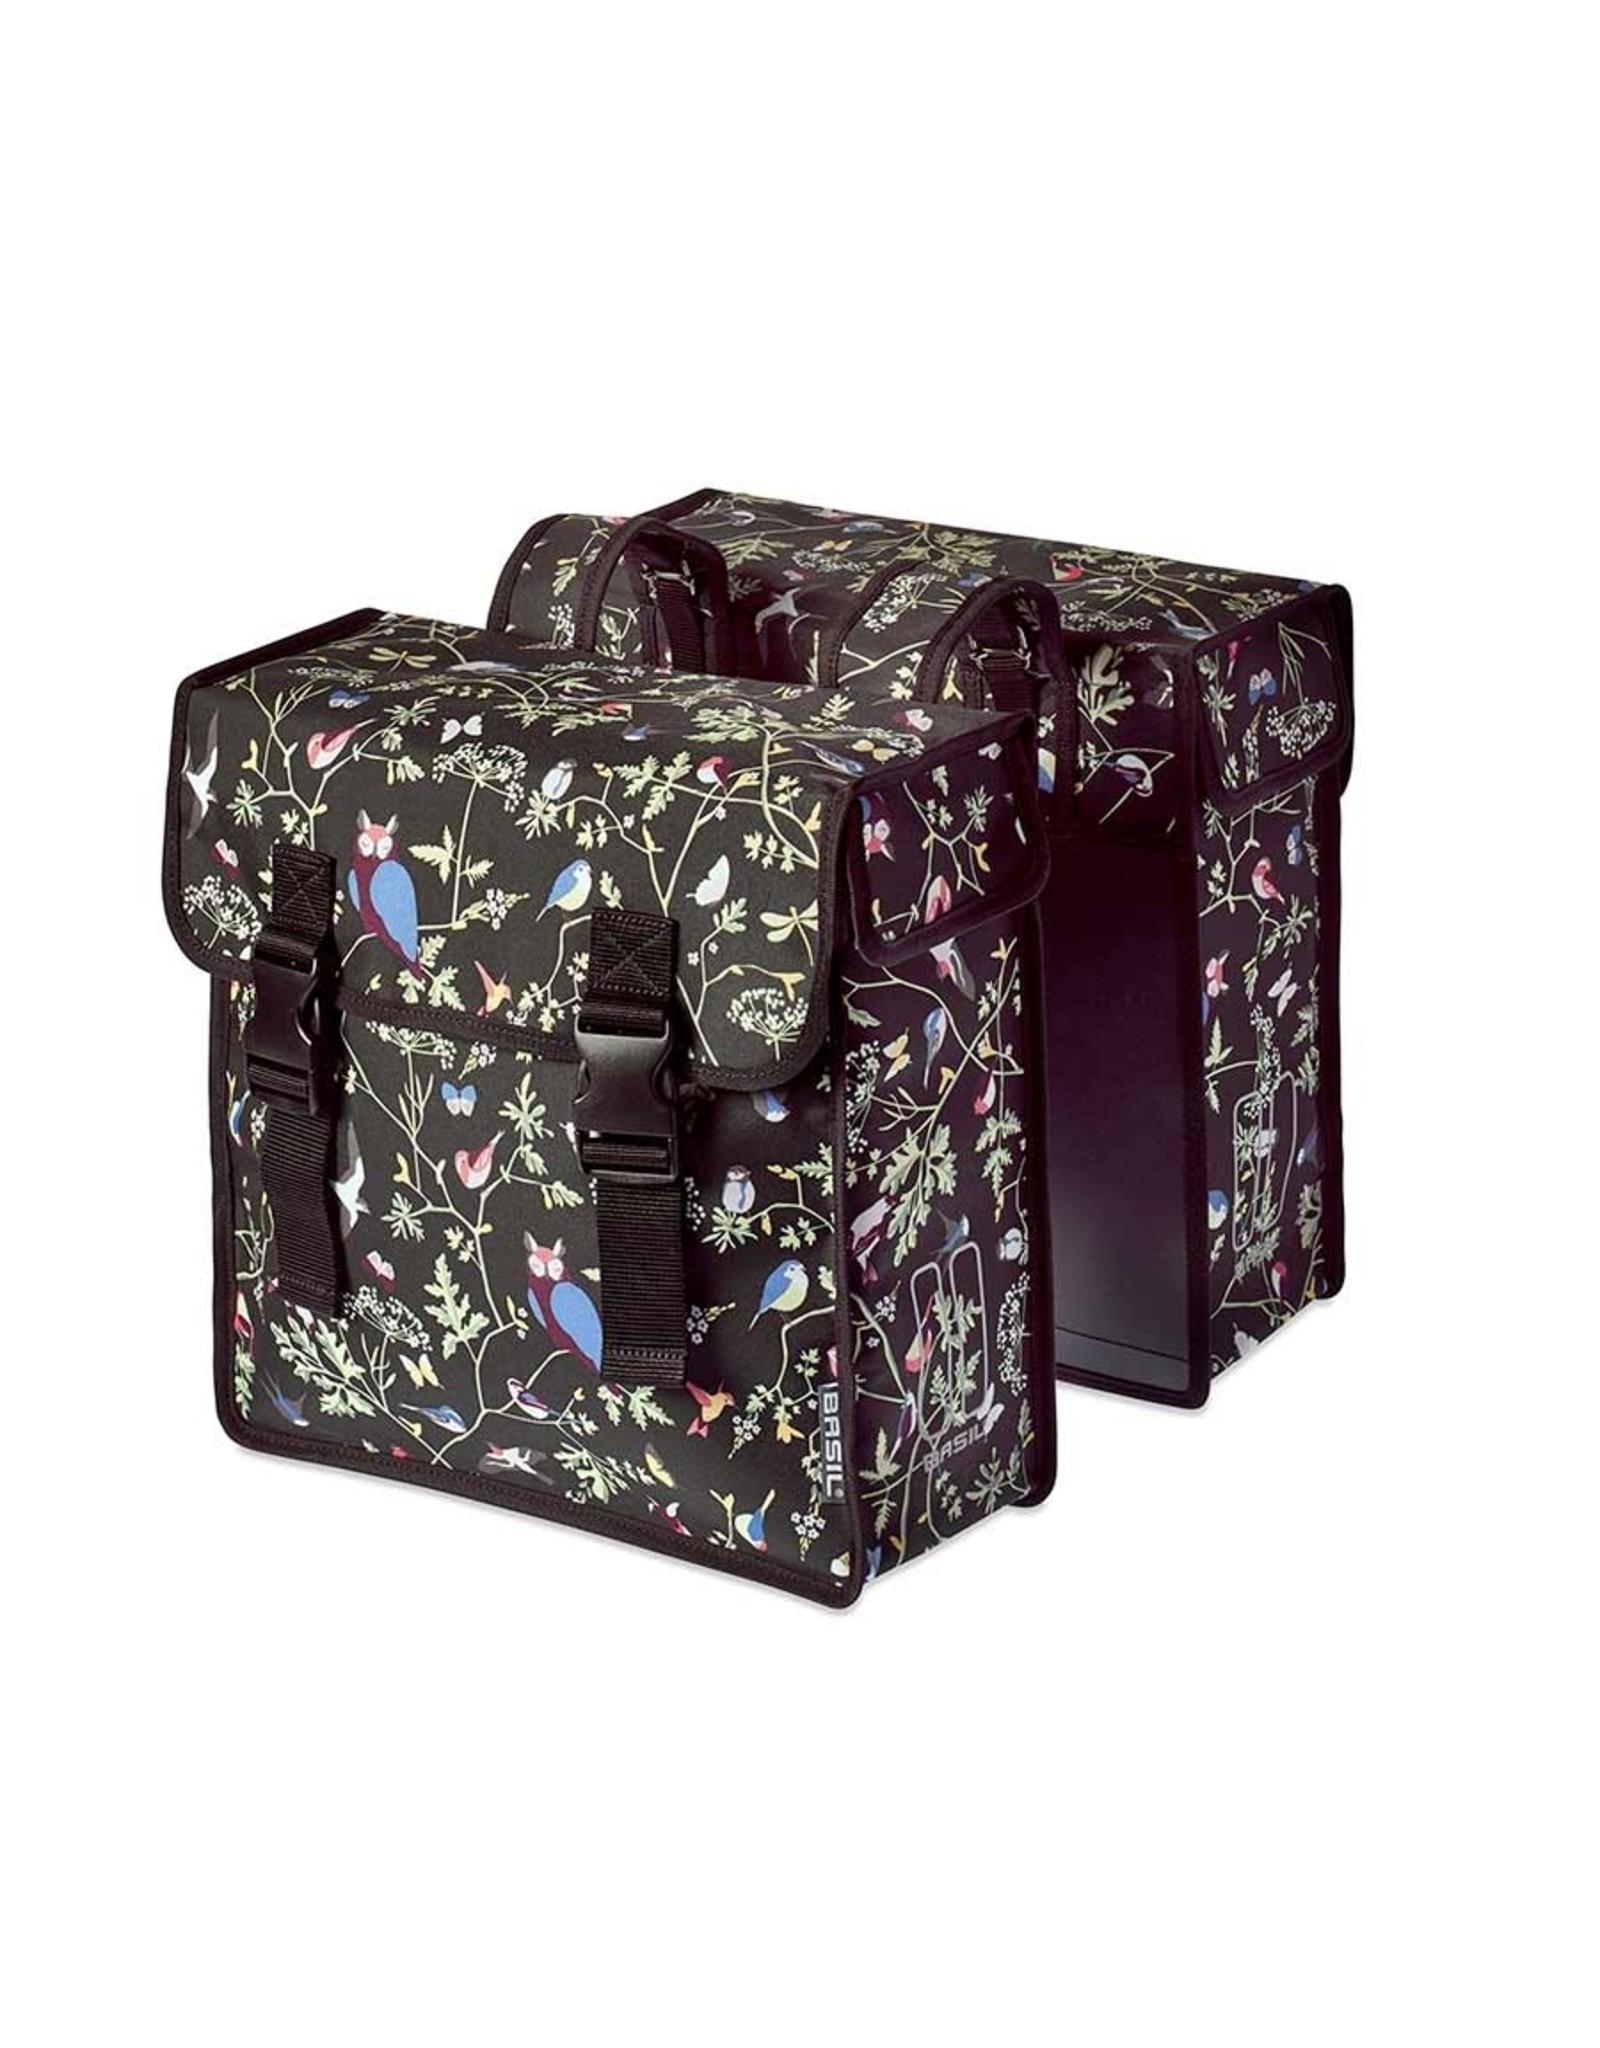 Basil Wanderlust Double Bag, Double bag, Charcoal